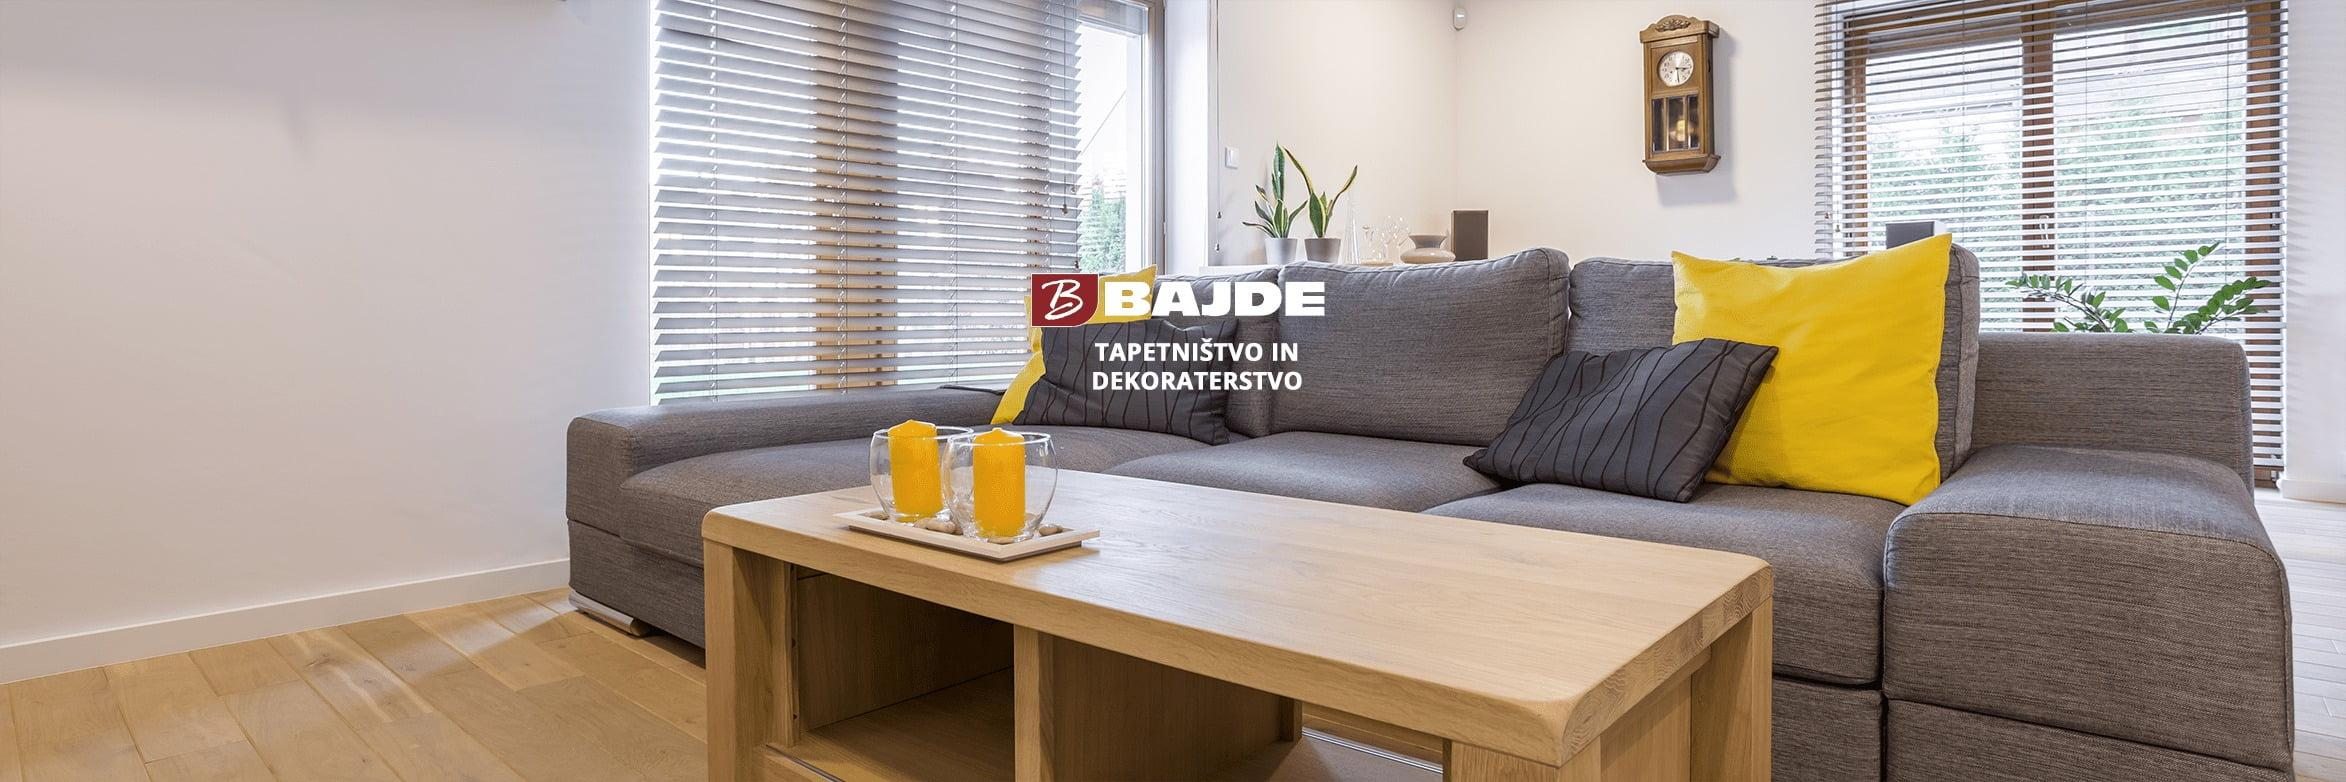 Tapetništvo & dekoraterstvo BAJDE 3bajde-a